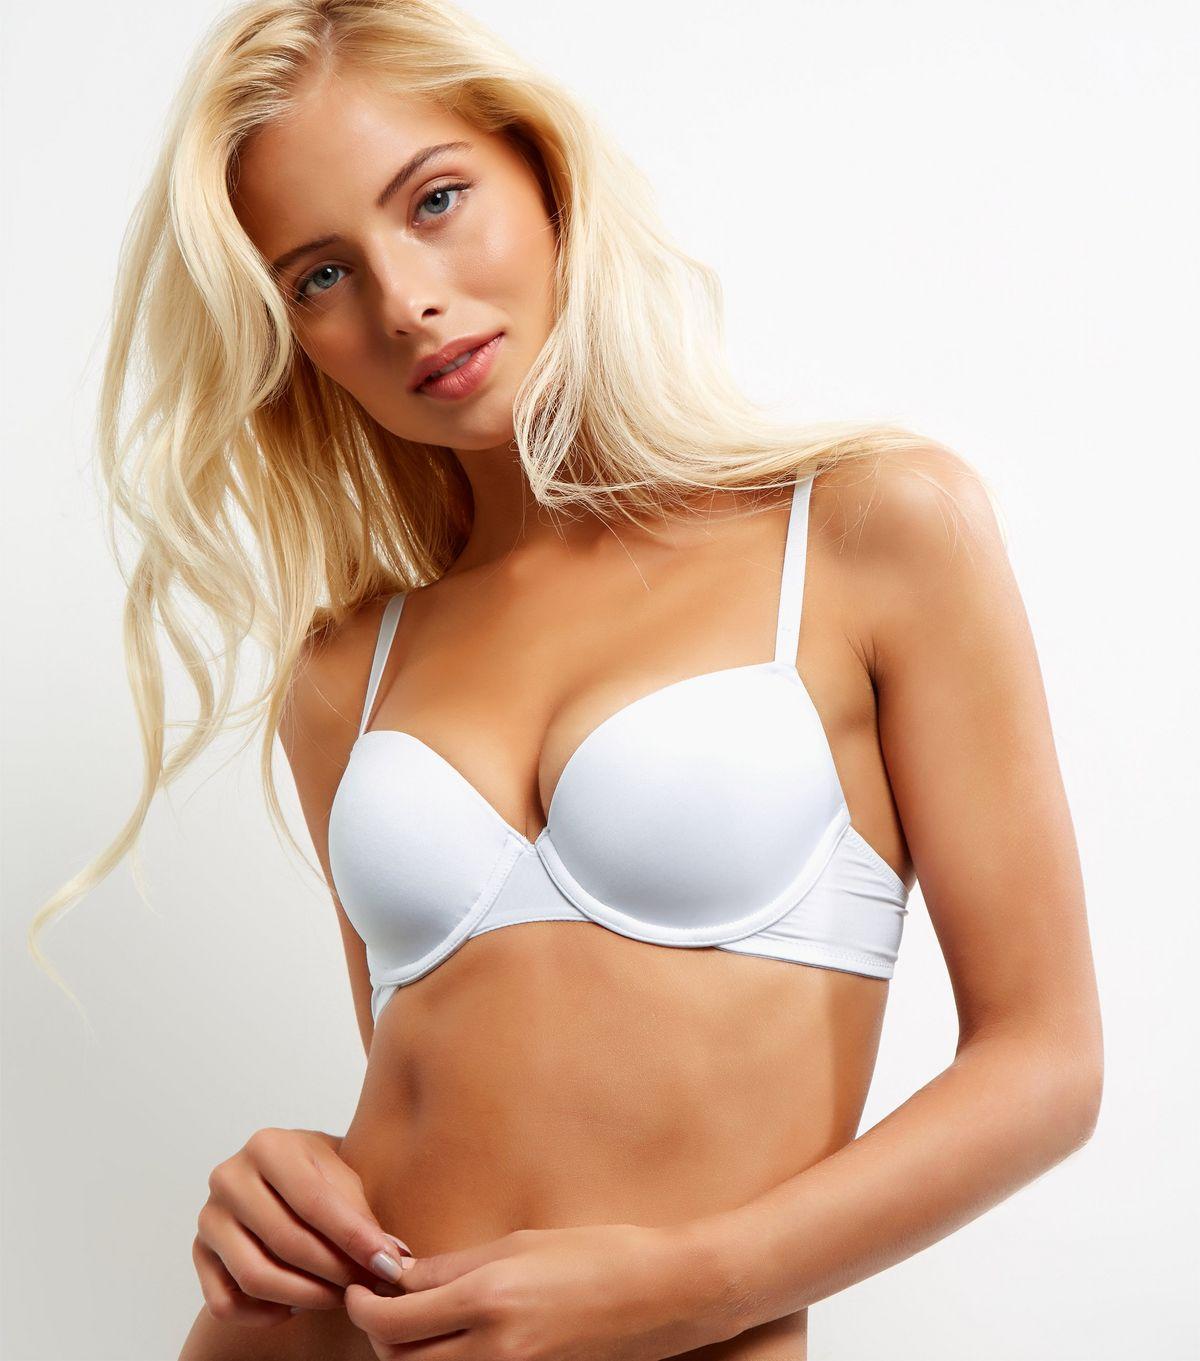 http://media.newlookassets.com/i/newlook/379407710/womens/lingerie/bras/white-microfibre-t-shirt-bra/?$new_pdp_szoom_image_1200$